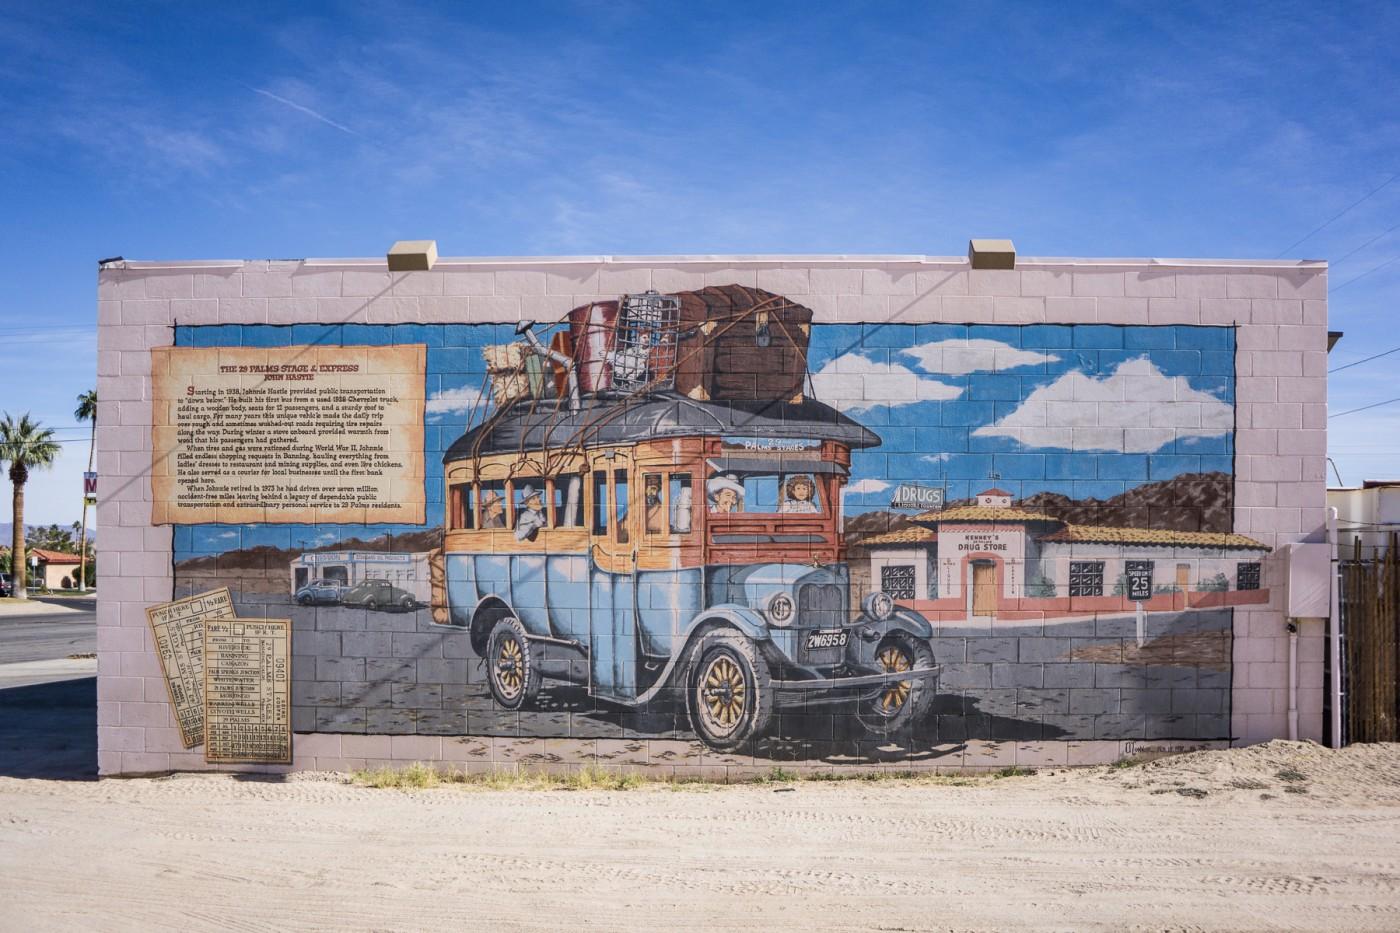 Desert Street Art 20 Paintings In Twentynine Palms An